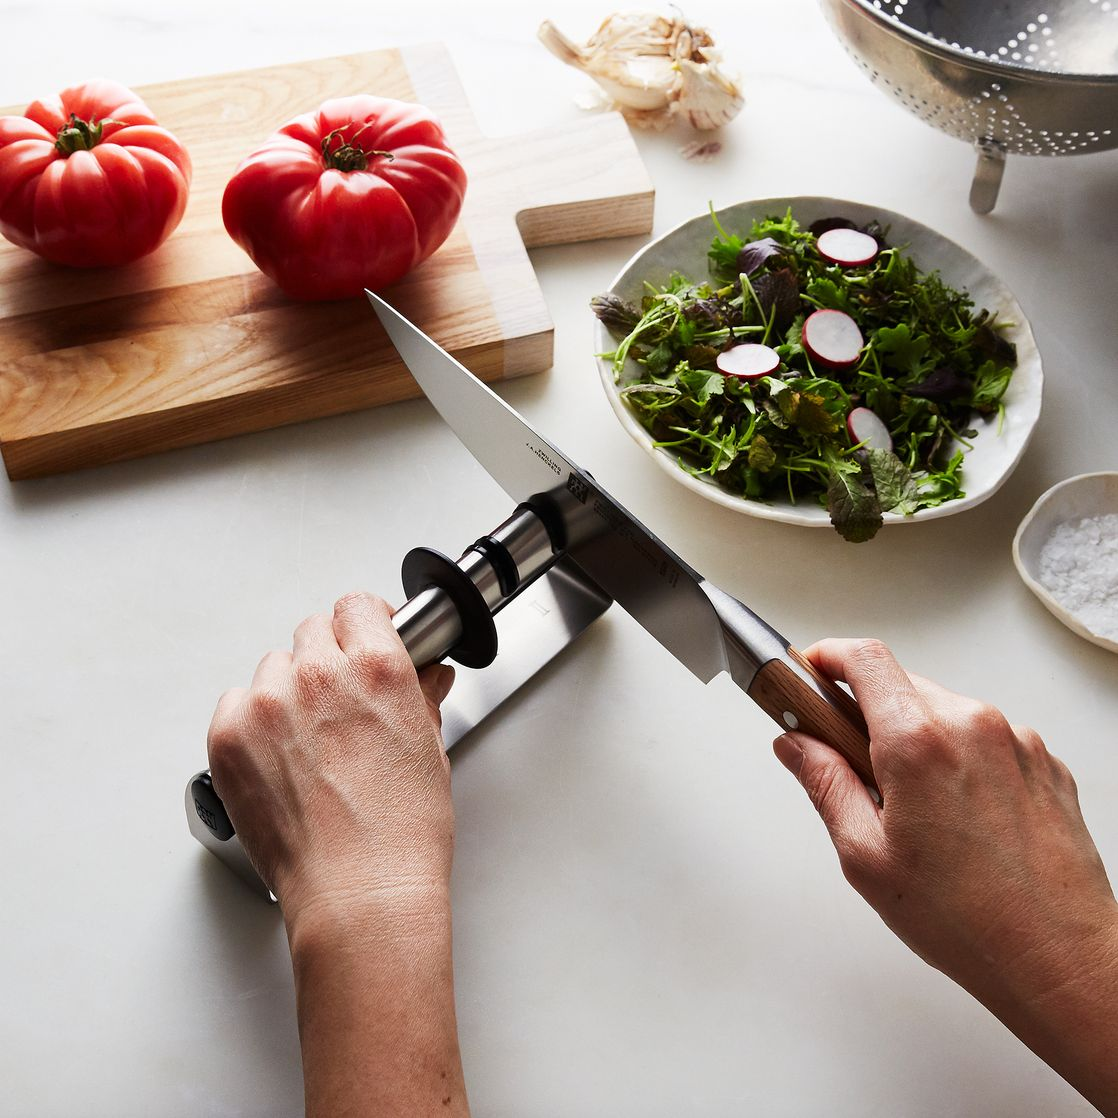 8 Best Kitchen Gadgets To Make Cooking Safer